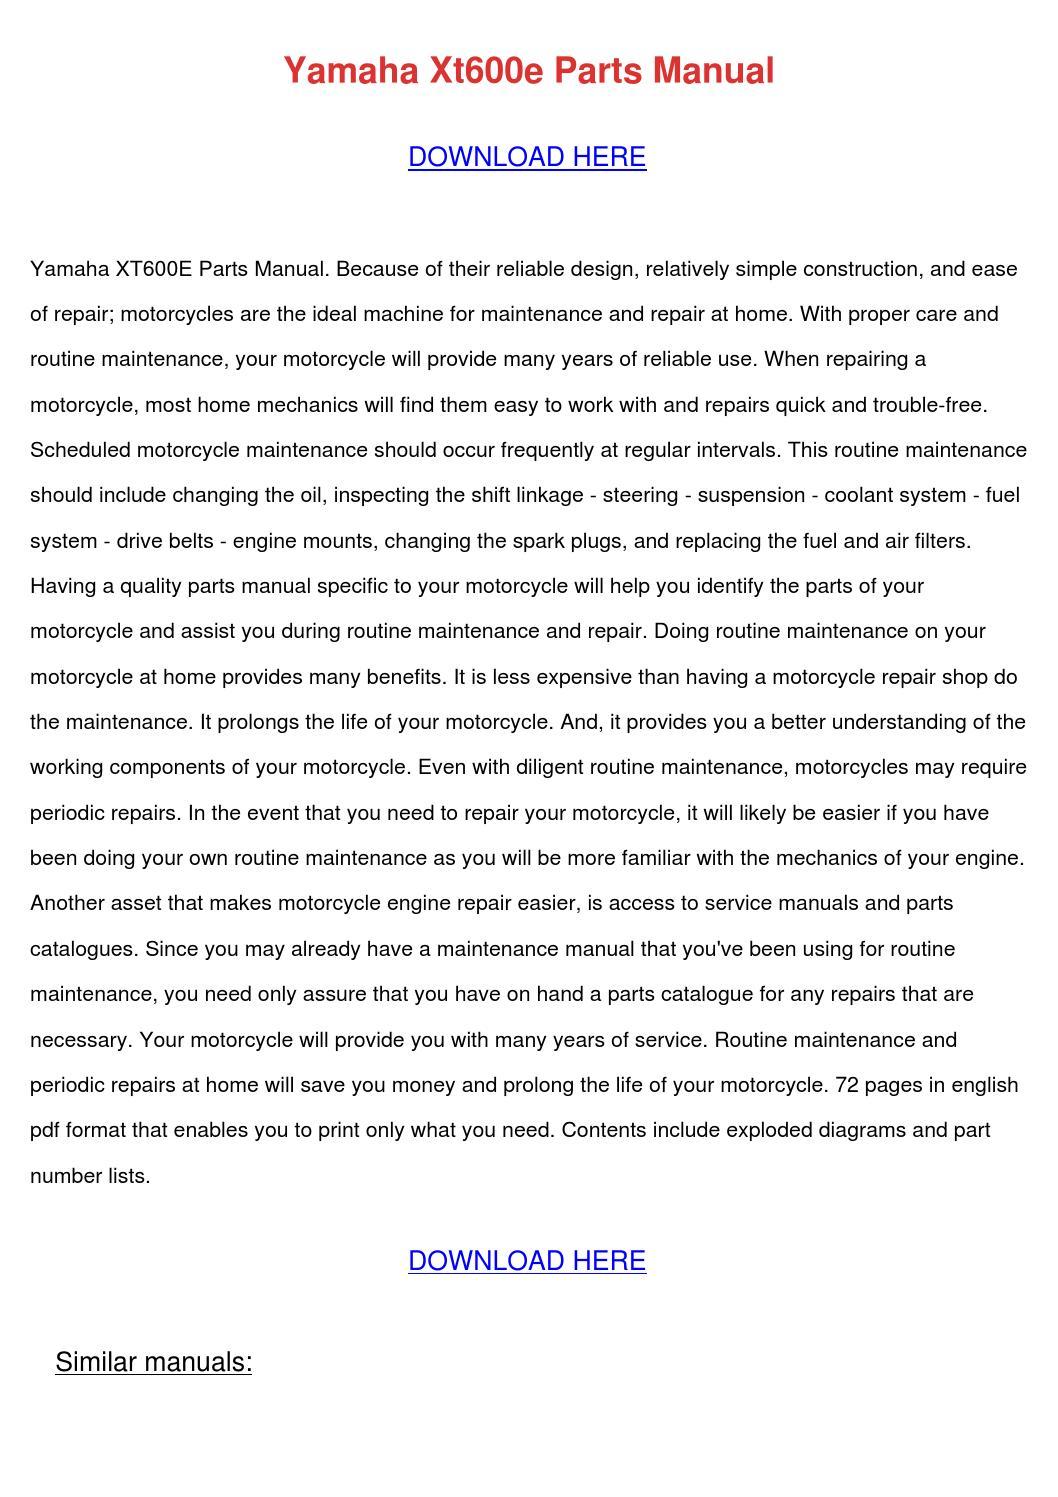 hight resolution of yamaha xt600e manuals